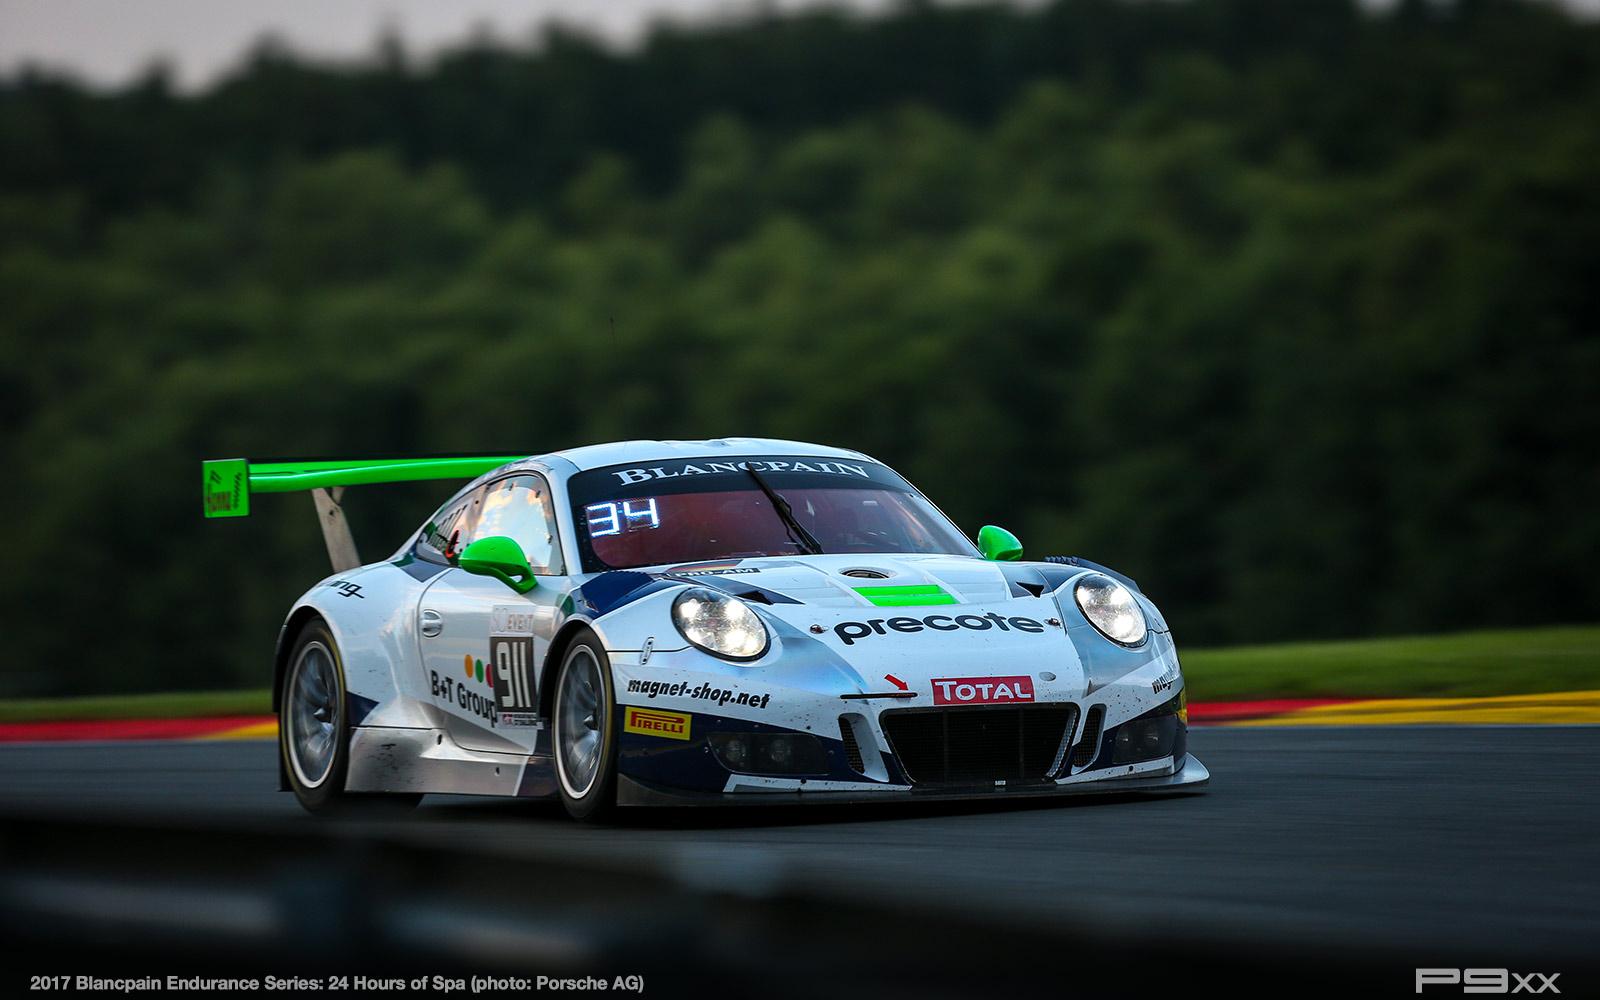 2017-24-Hours-of-Spa-Porsche-318